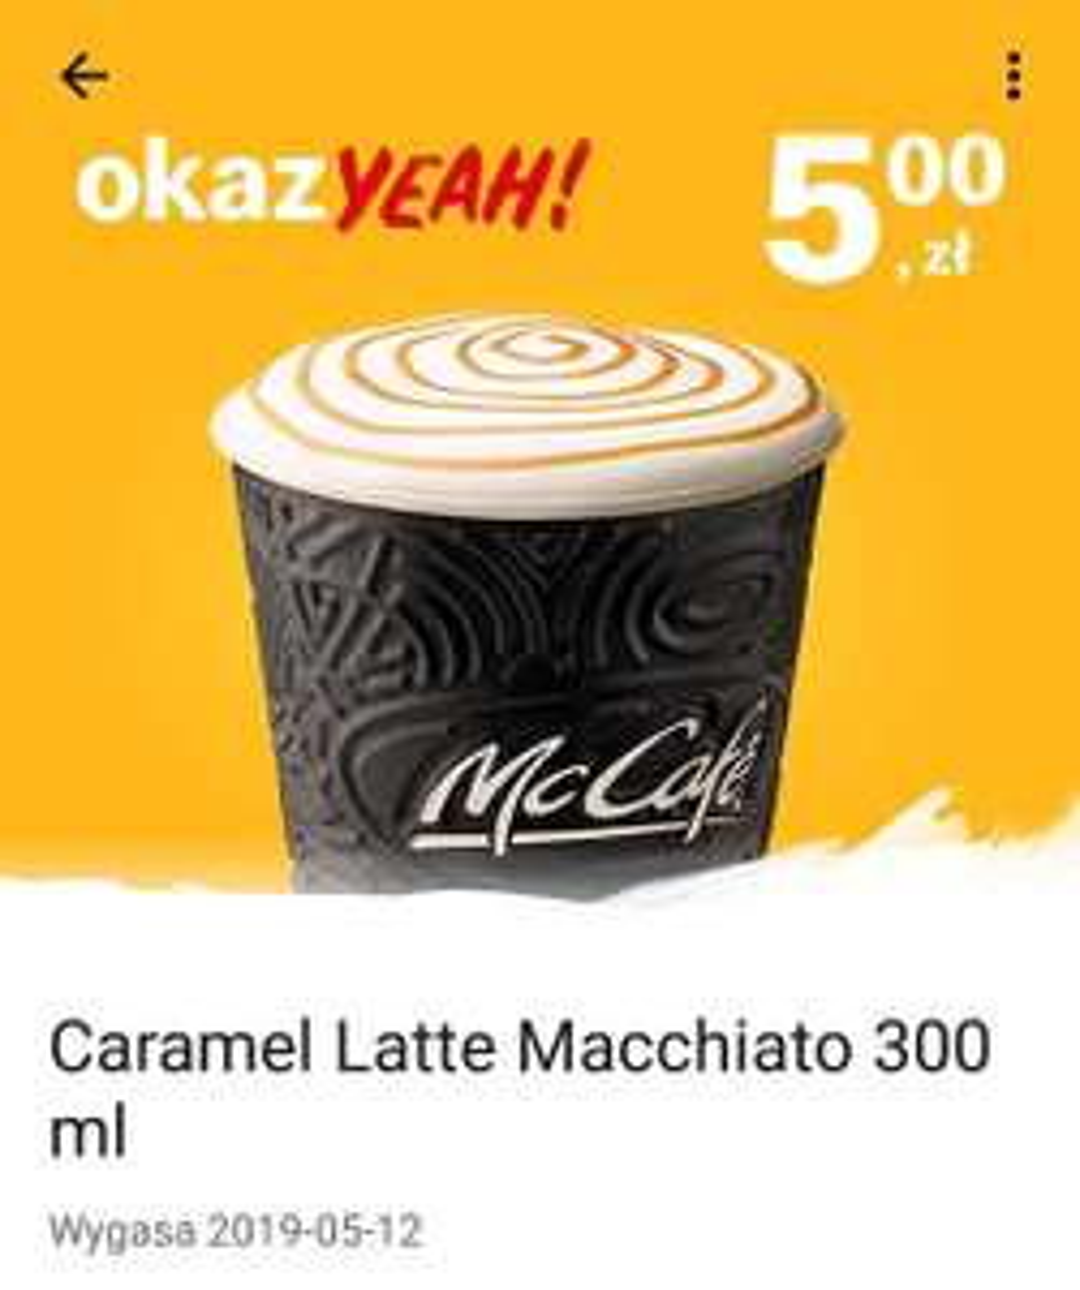 Caramel Latte Macchiato 300ml za 5zł w McDonald's KOD: 218579